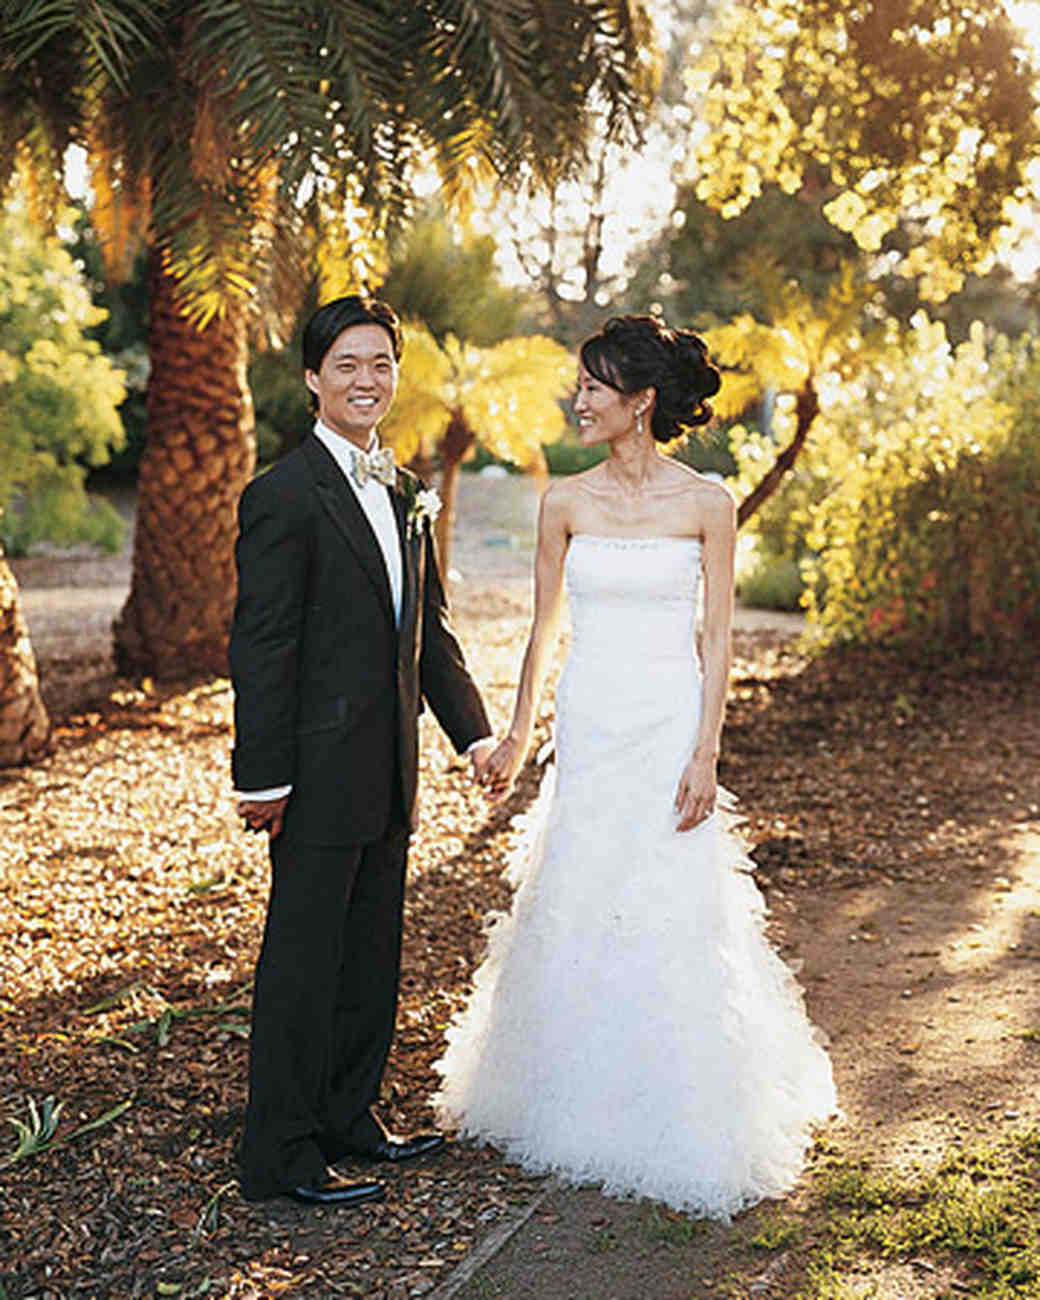 mwa102306_fal06_couple_gard.jpg